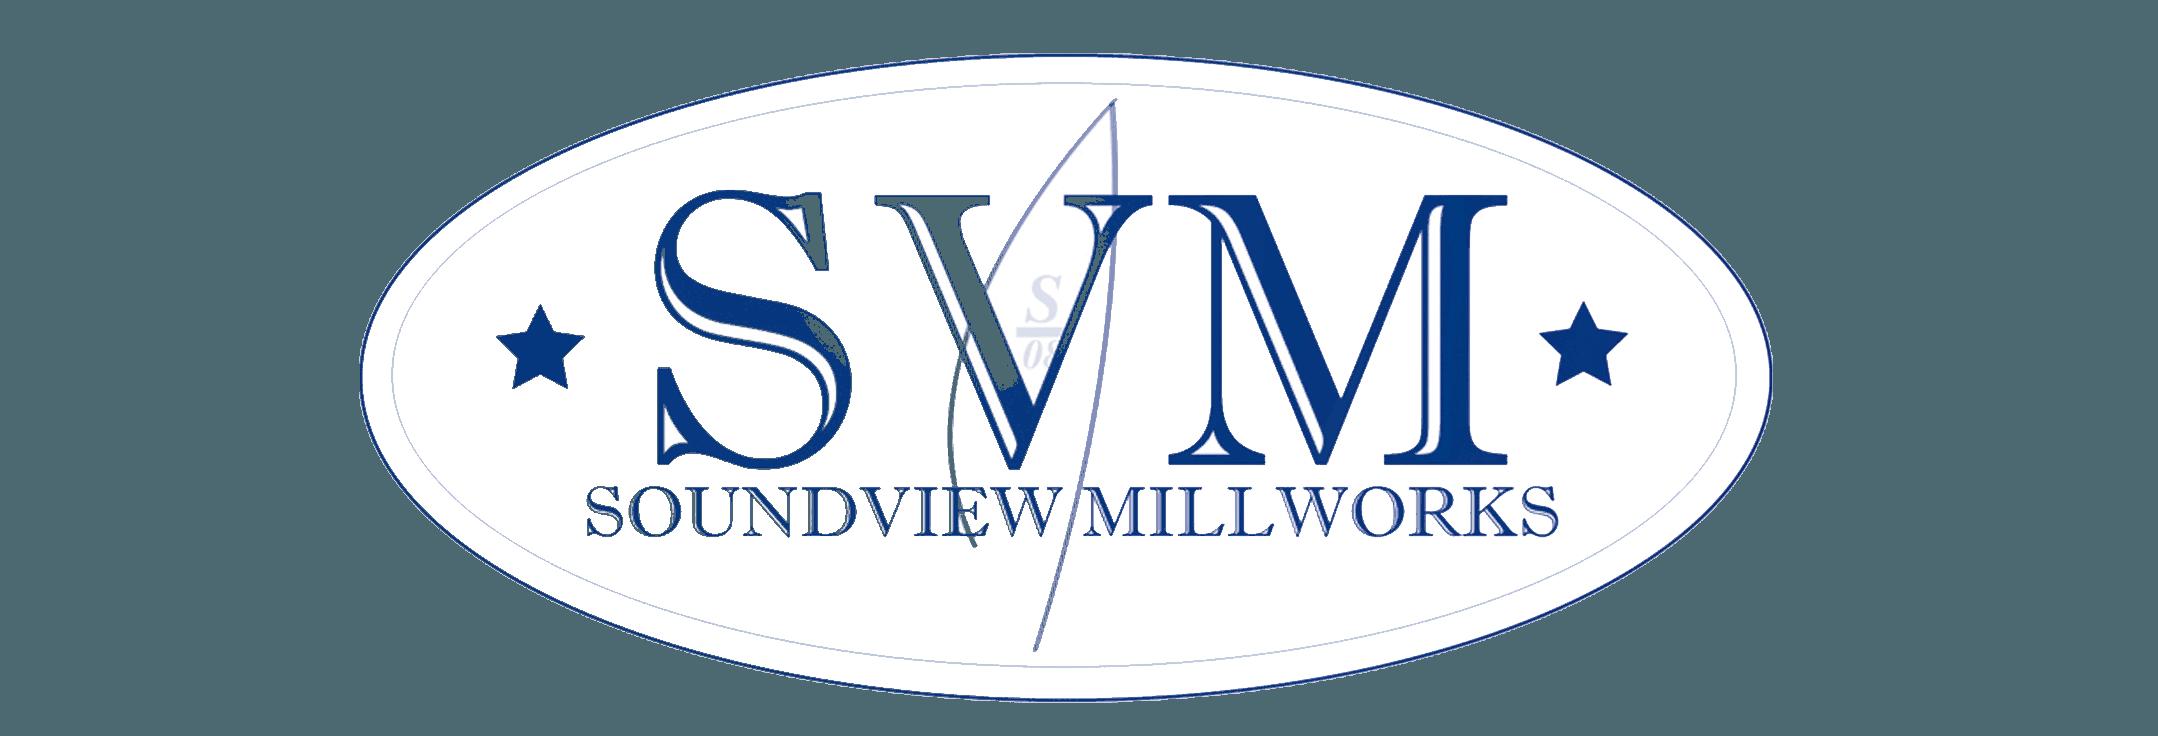 Soundview Millworks